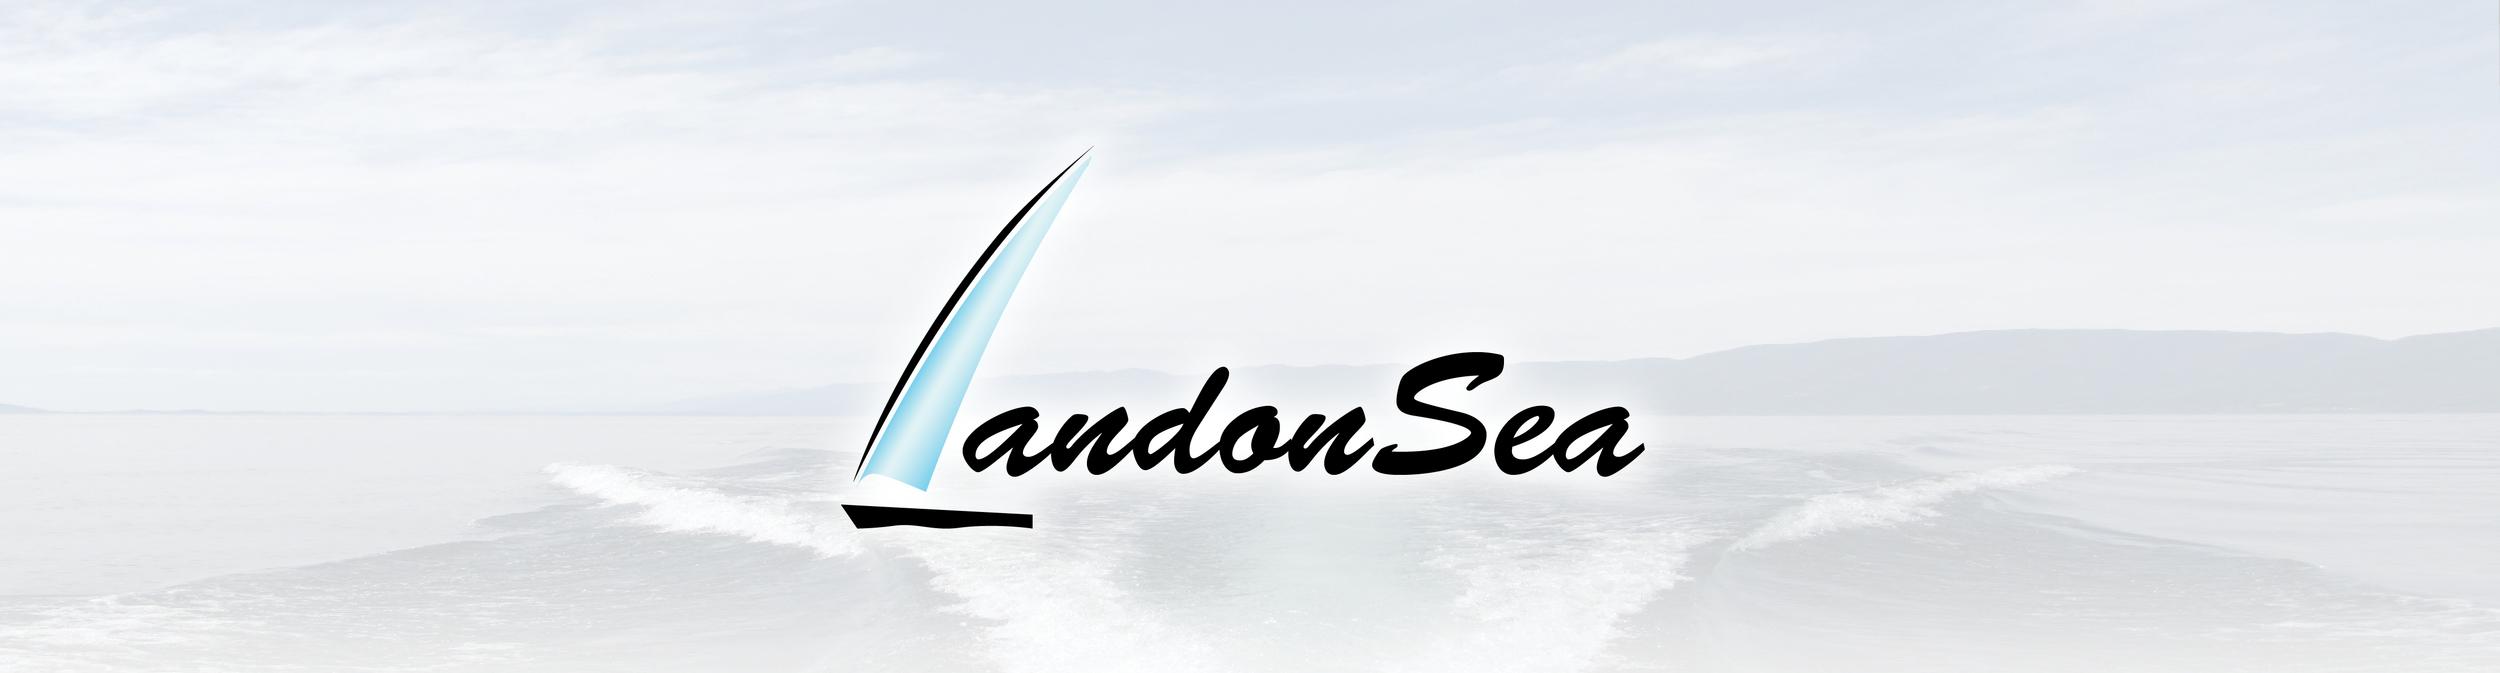 Landing Pages banner.jpg